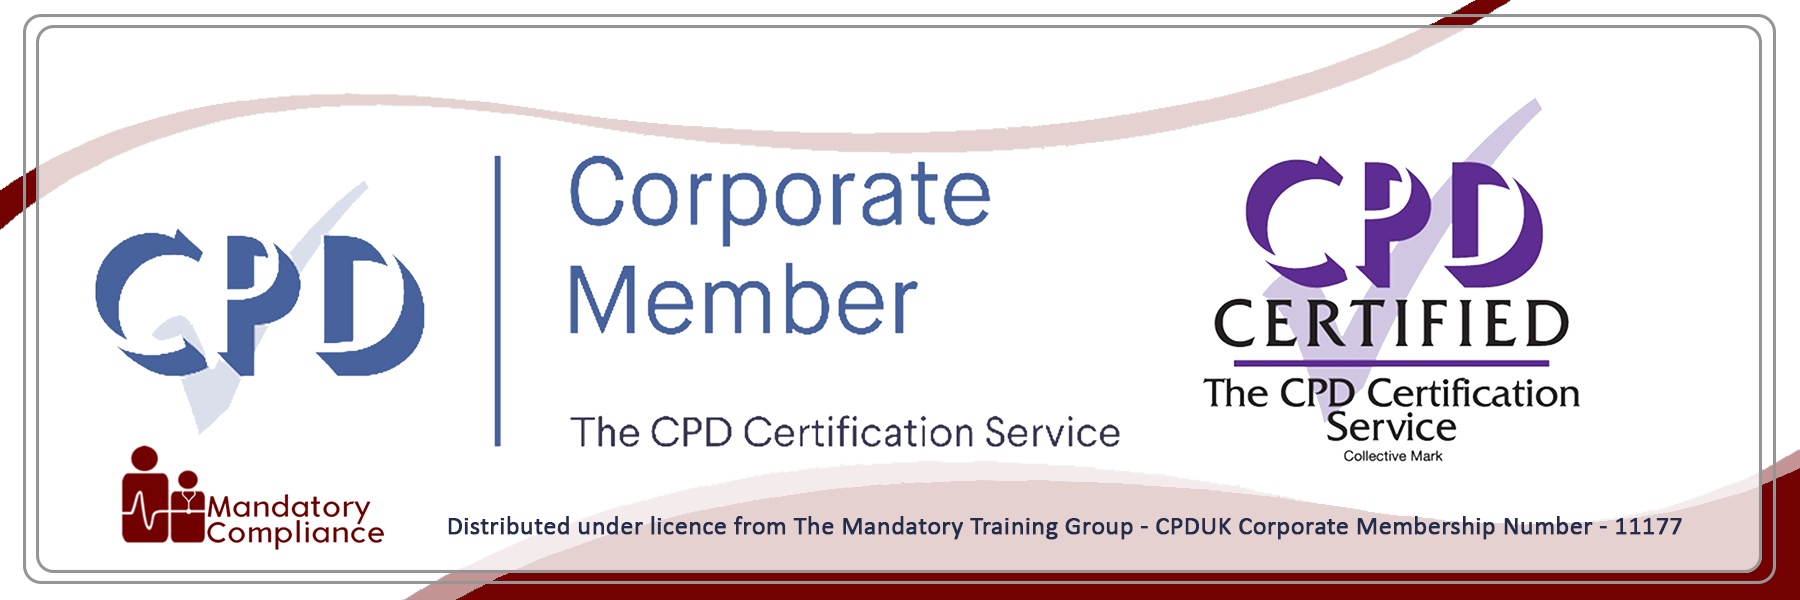 Mastering Microsoft Excel 2019 - Intermediate - Online Training Course - The Mandatory Training Group UK -